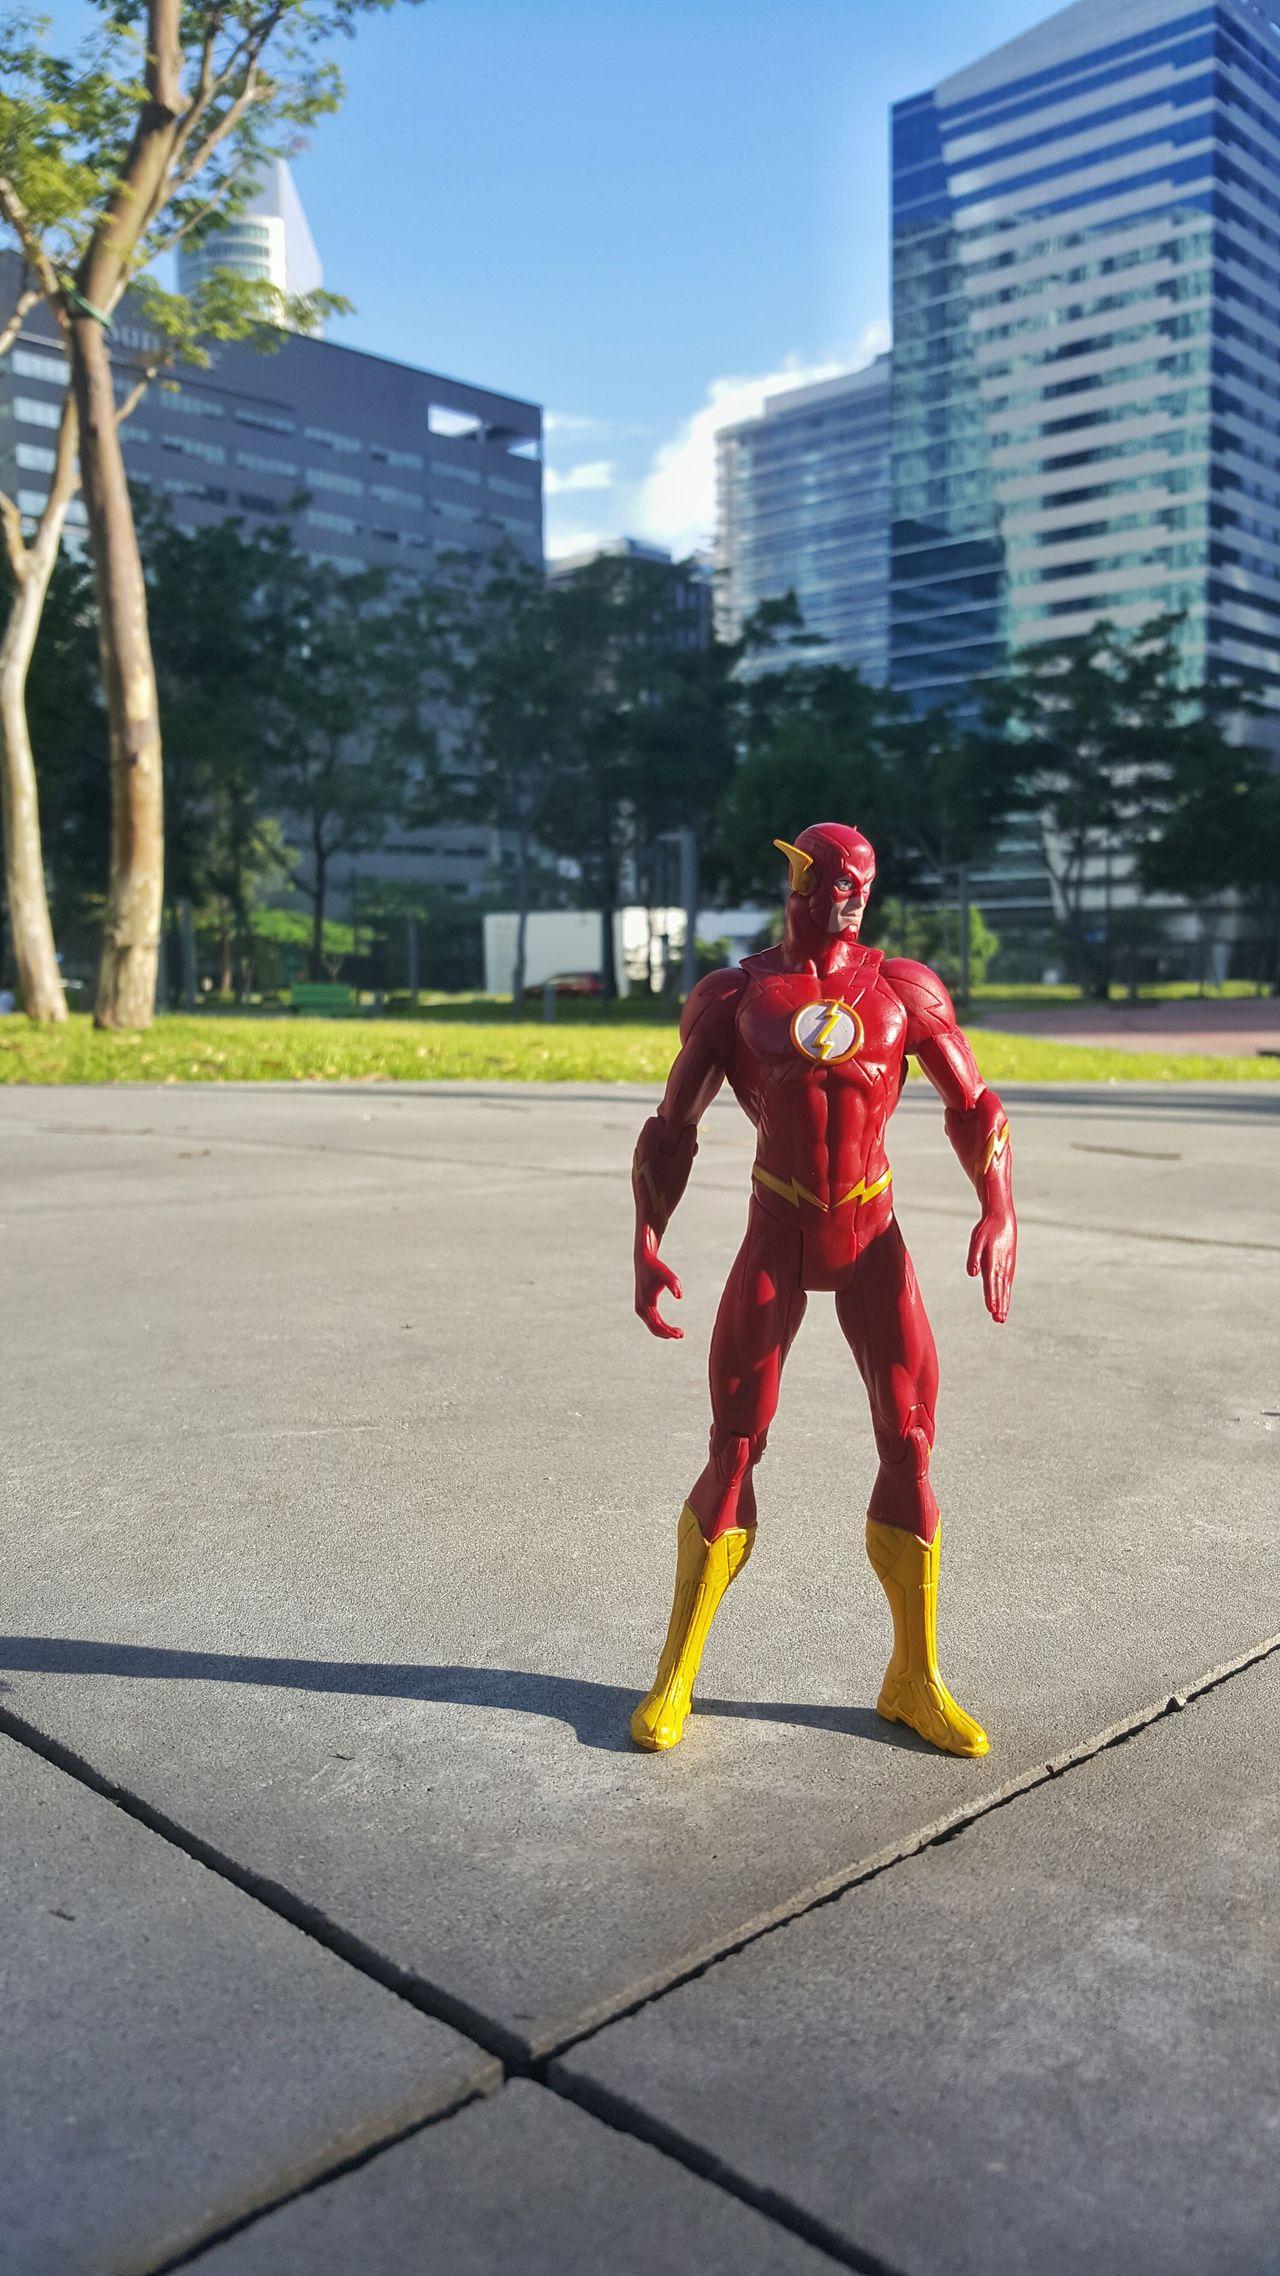 Speedster in the city EyeEm Gallery EyeEm Best Shots Toystory Toys4Me Justice League EyeEmBestPics Toyphotography Toy Photography Eyeem Philippines EyeEm Phillipines